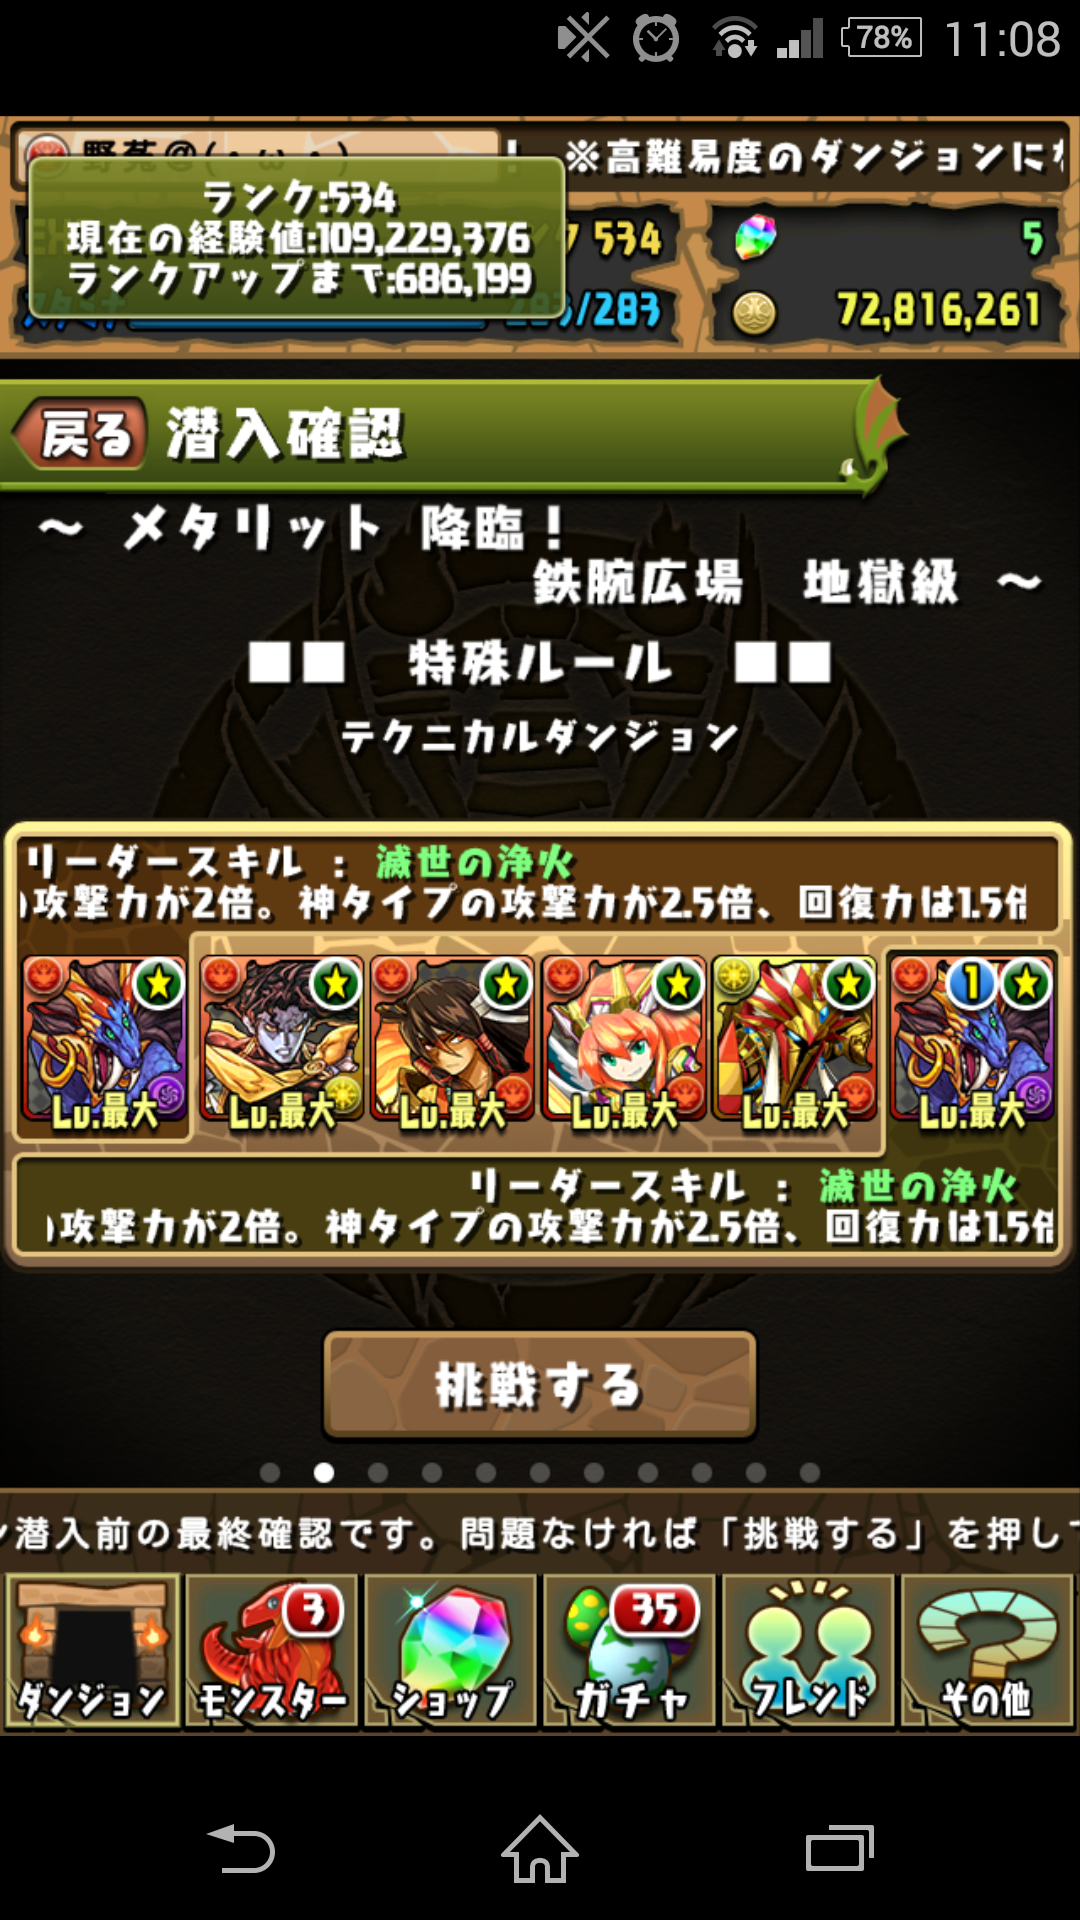 Screenshot_2015-10-29-23-08-58.png